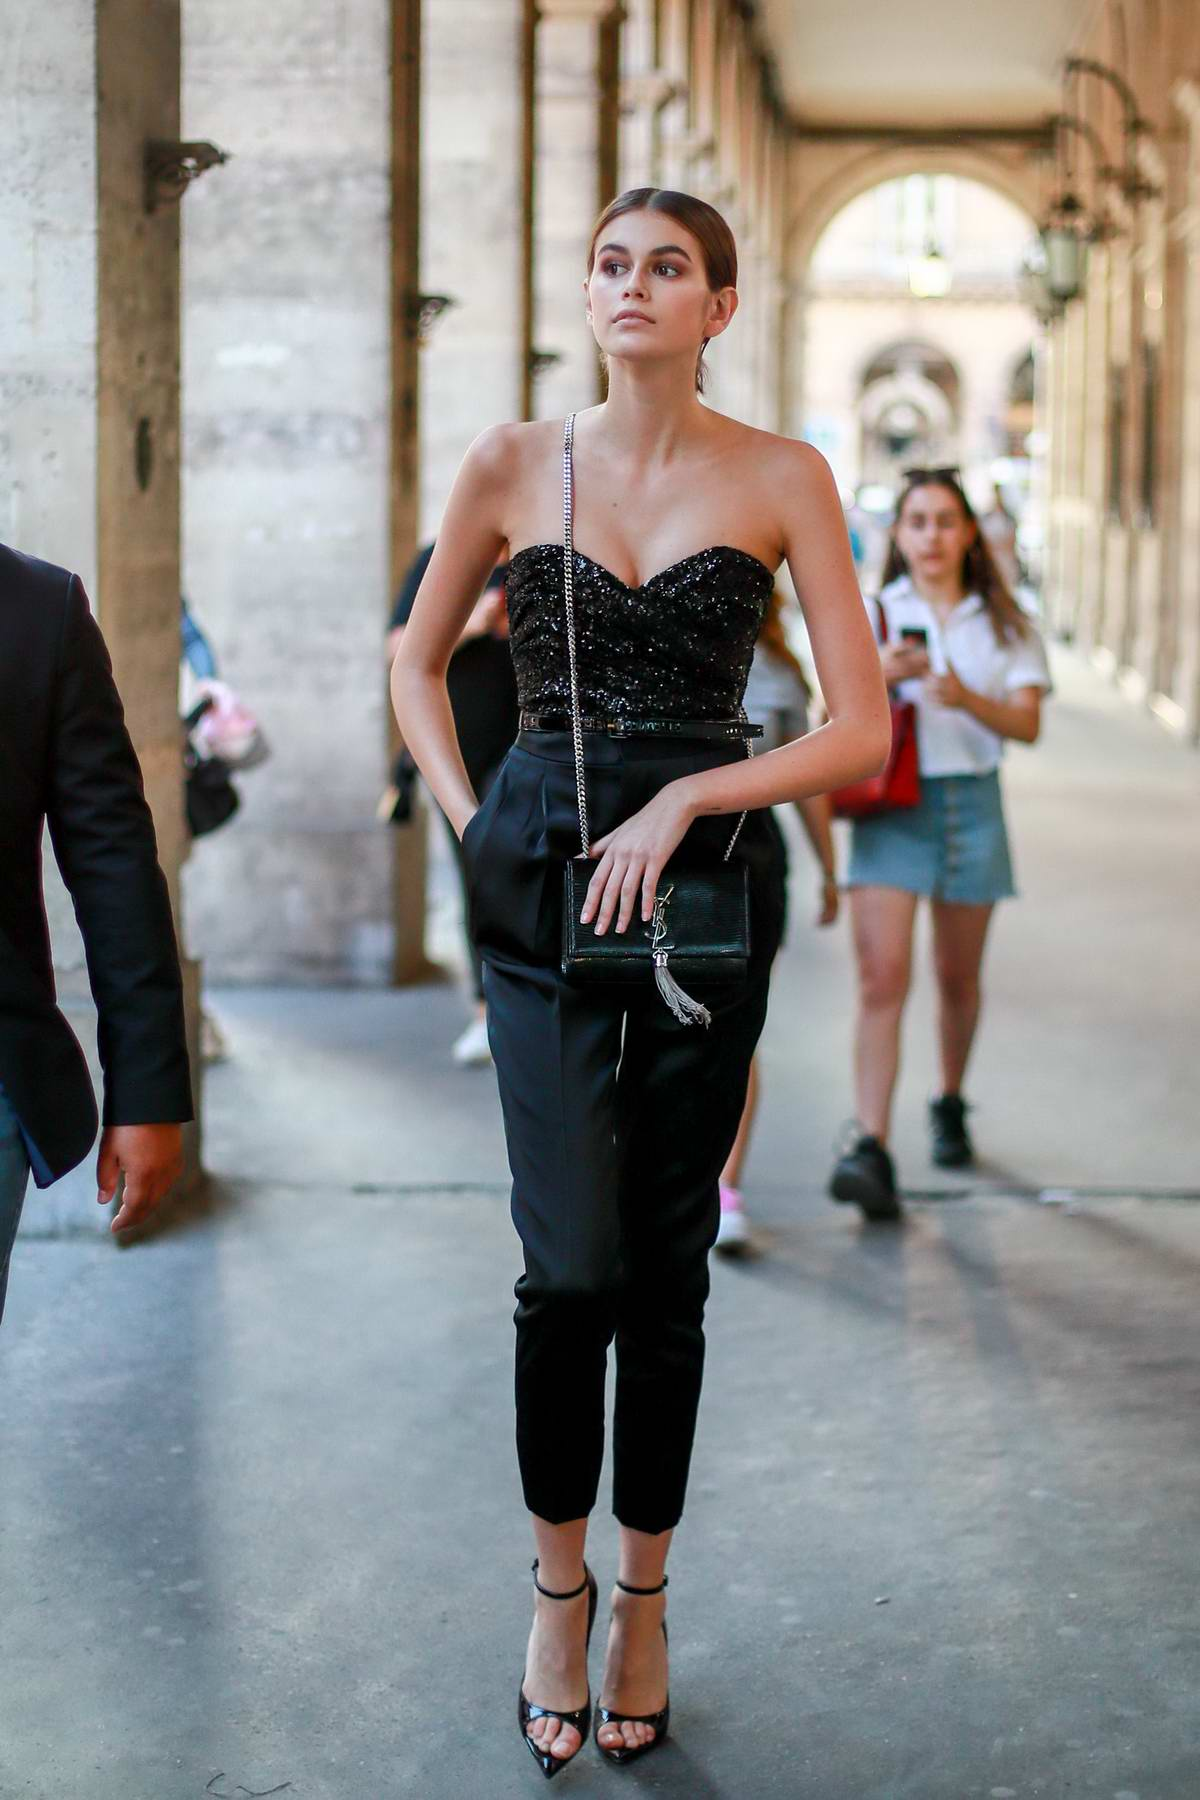 Kaia Gerber looks fashionable as she strolls through Rue de Rivoli in Paris, France